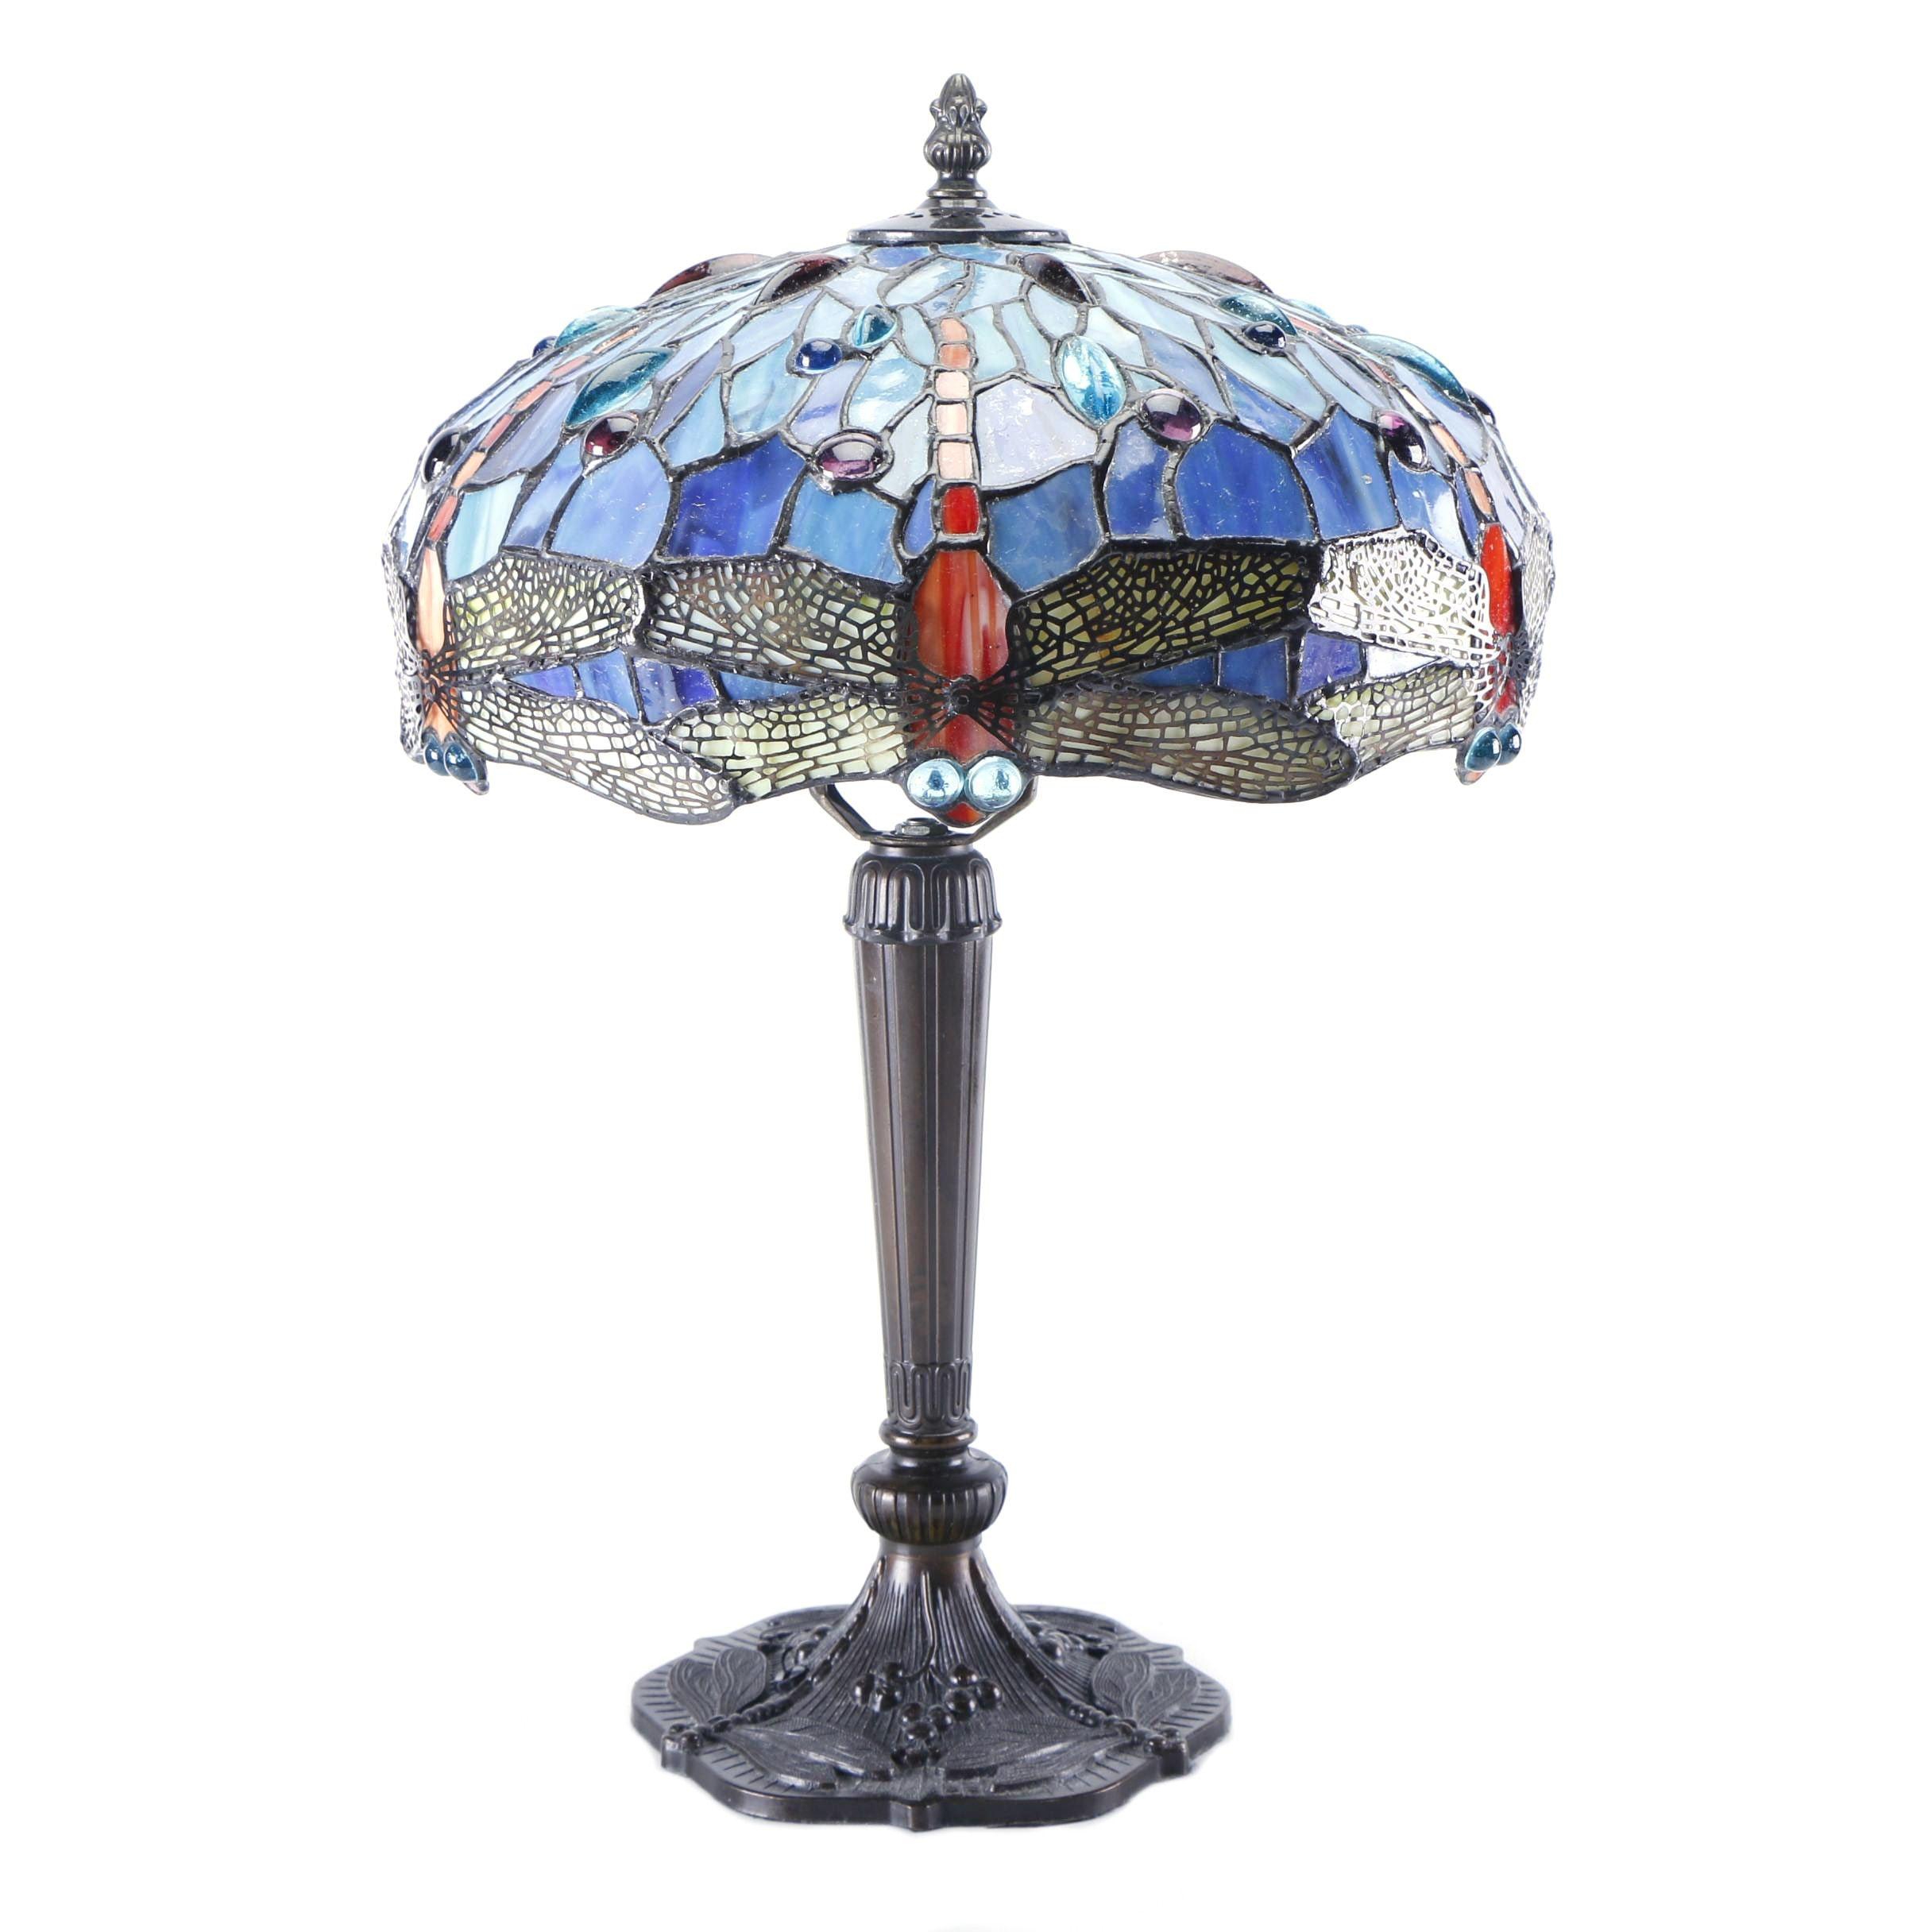 Tiffany Style Dragonfly Table Lamp Base And Shade ...